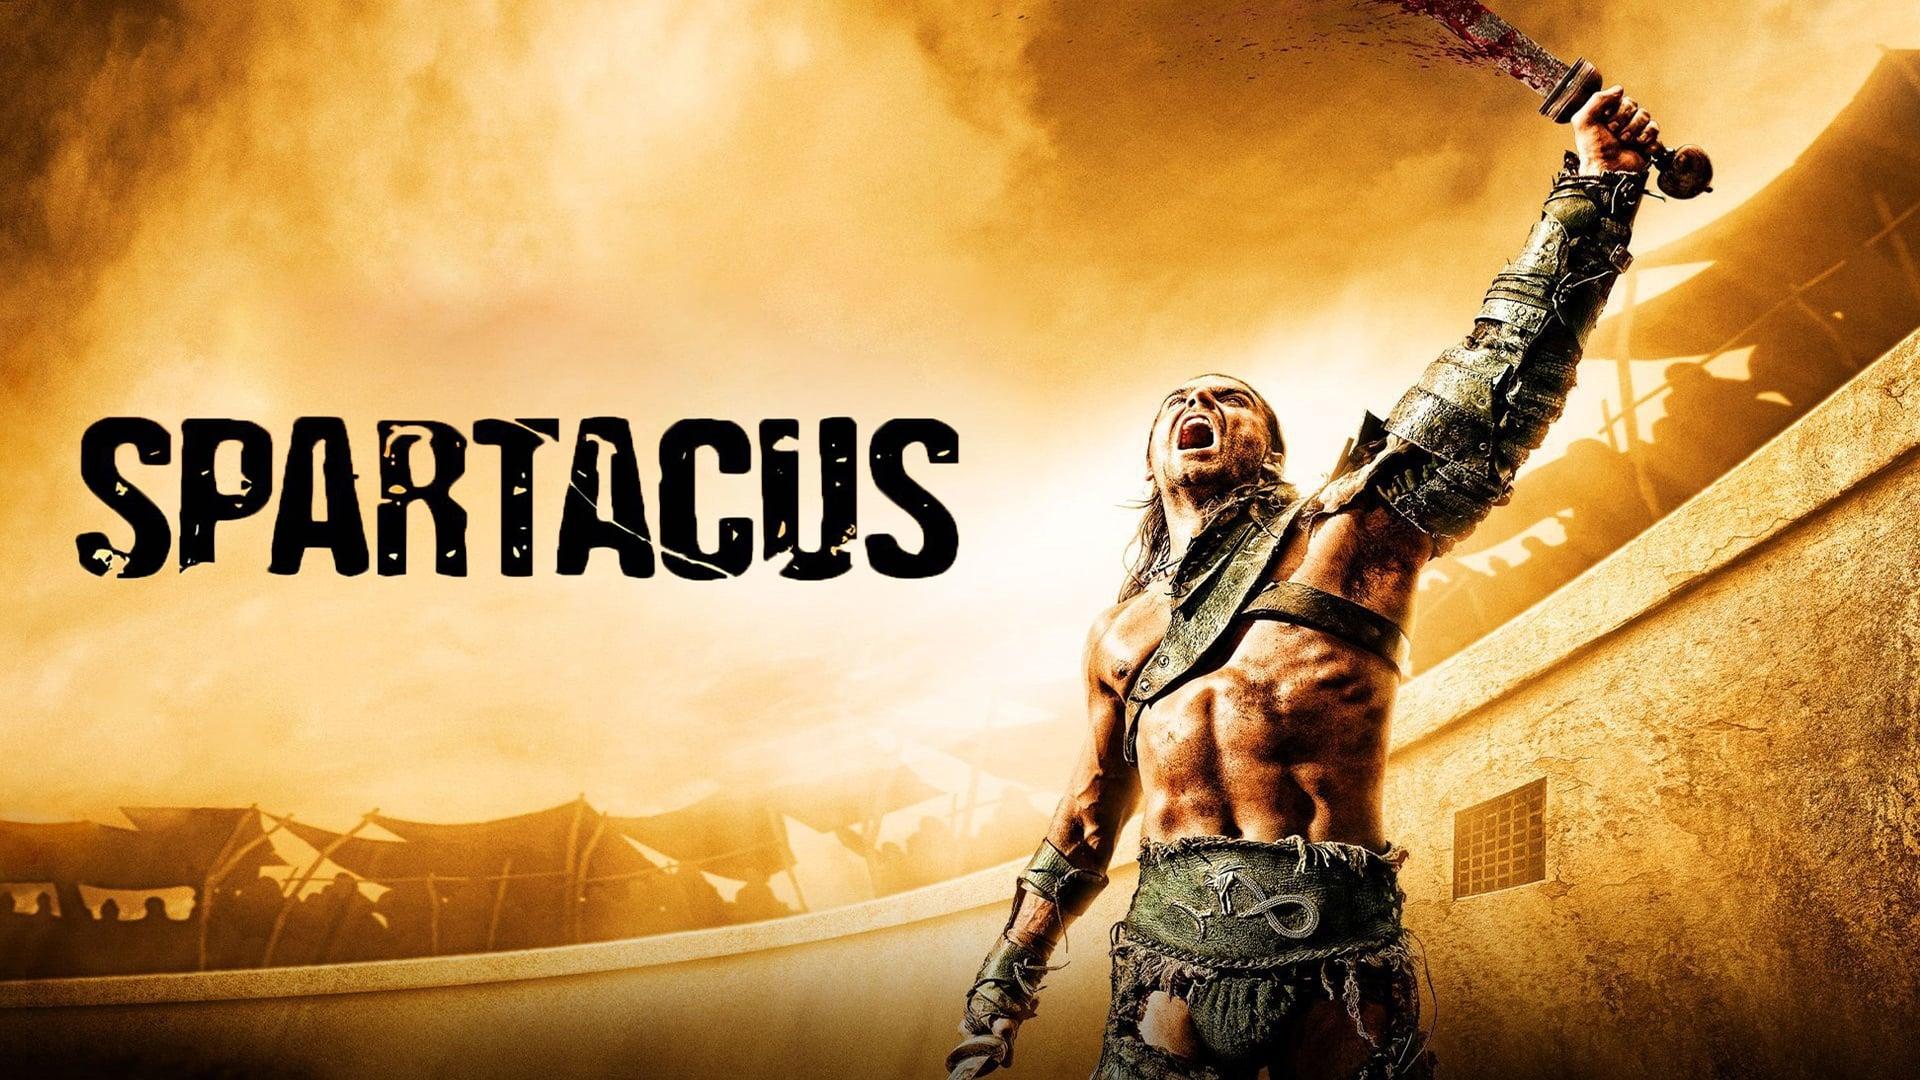 Spartacus Game Online